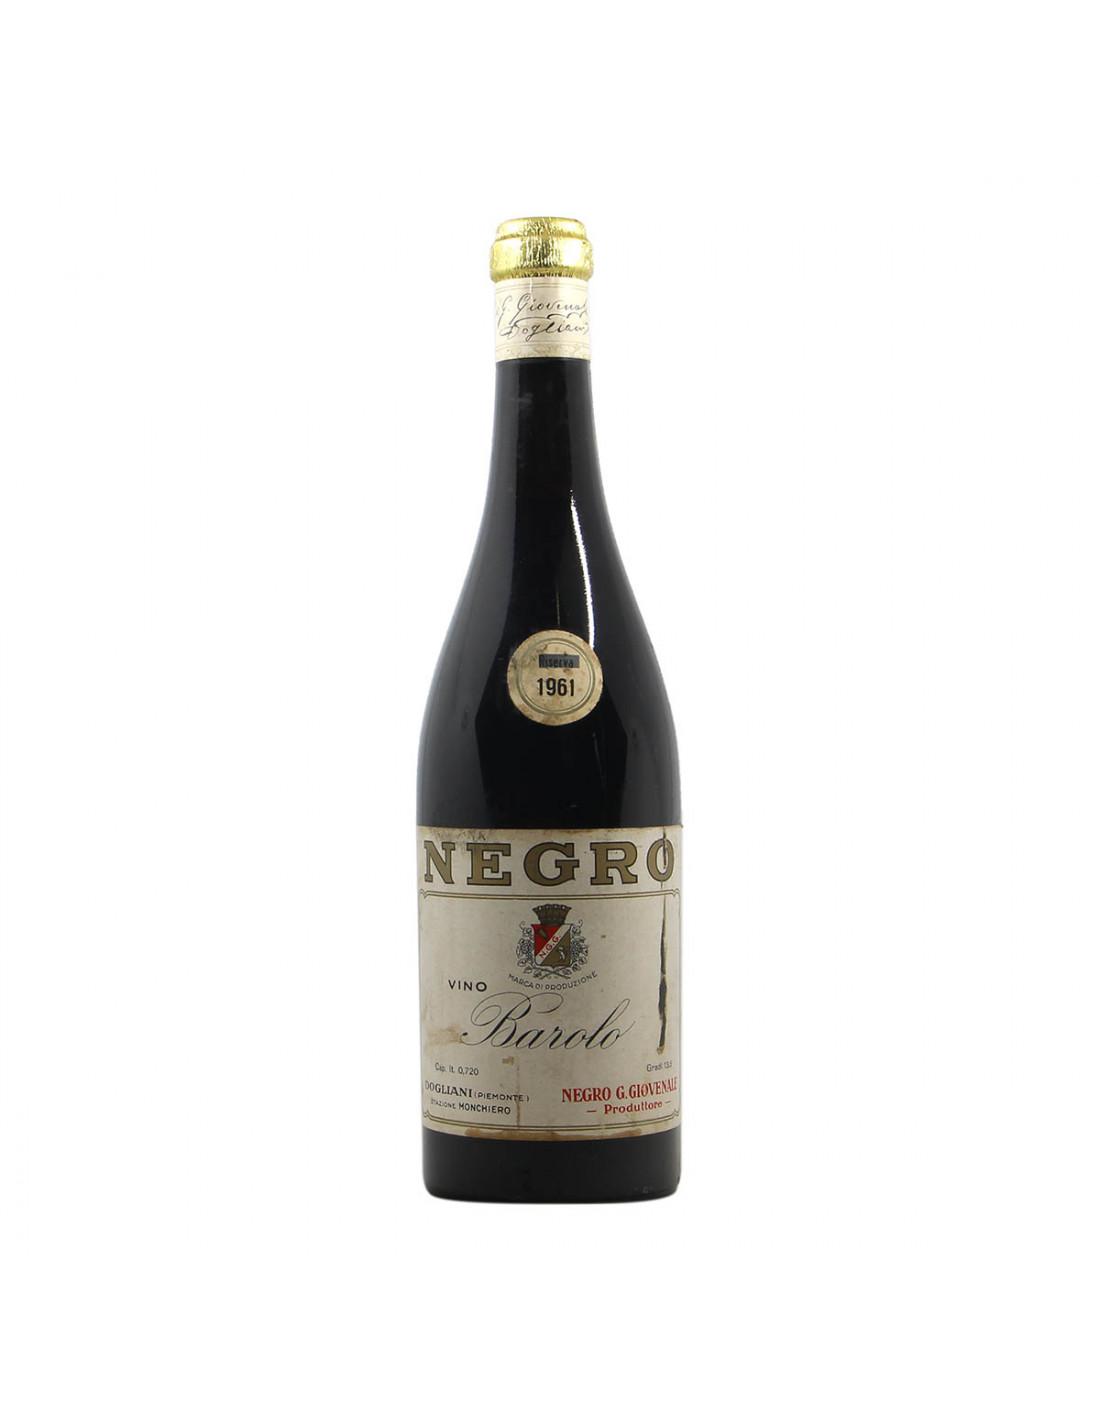 Negro Barolo 1961